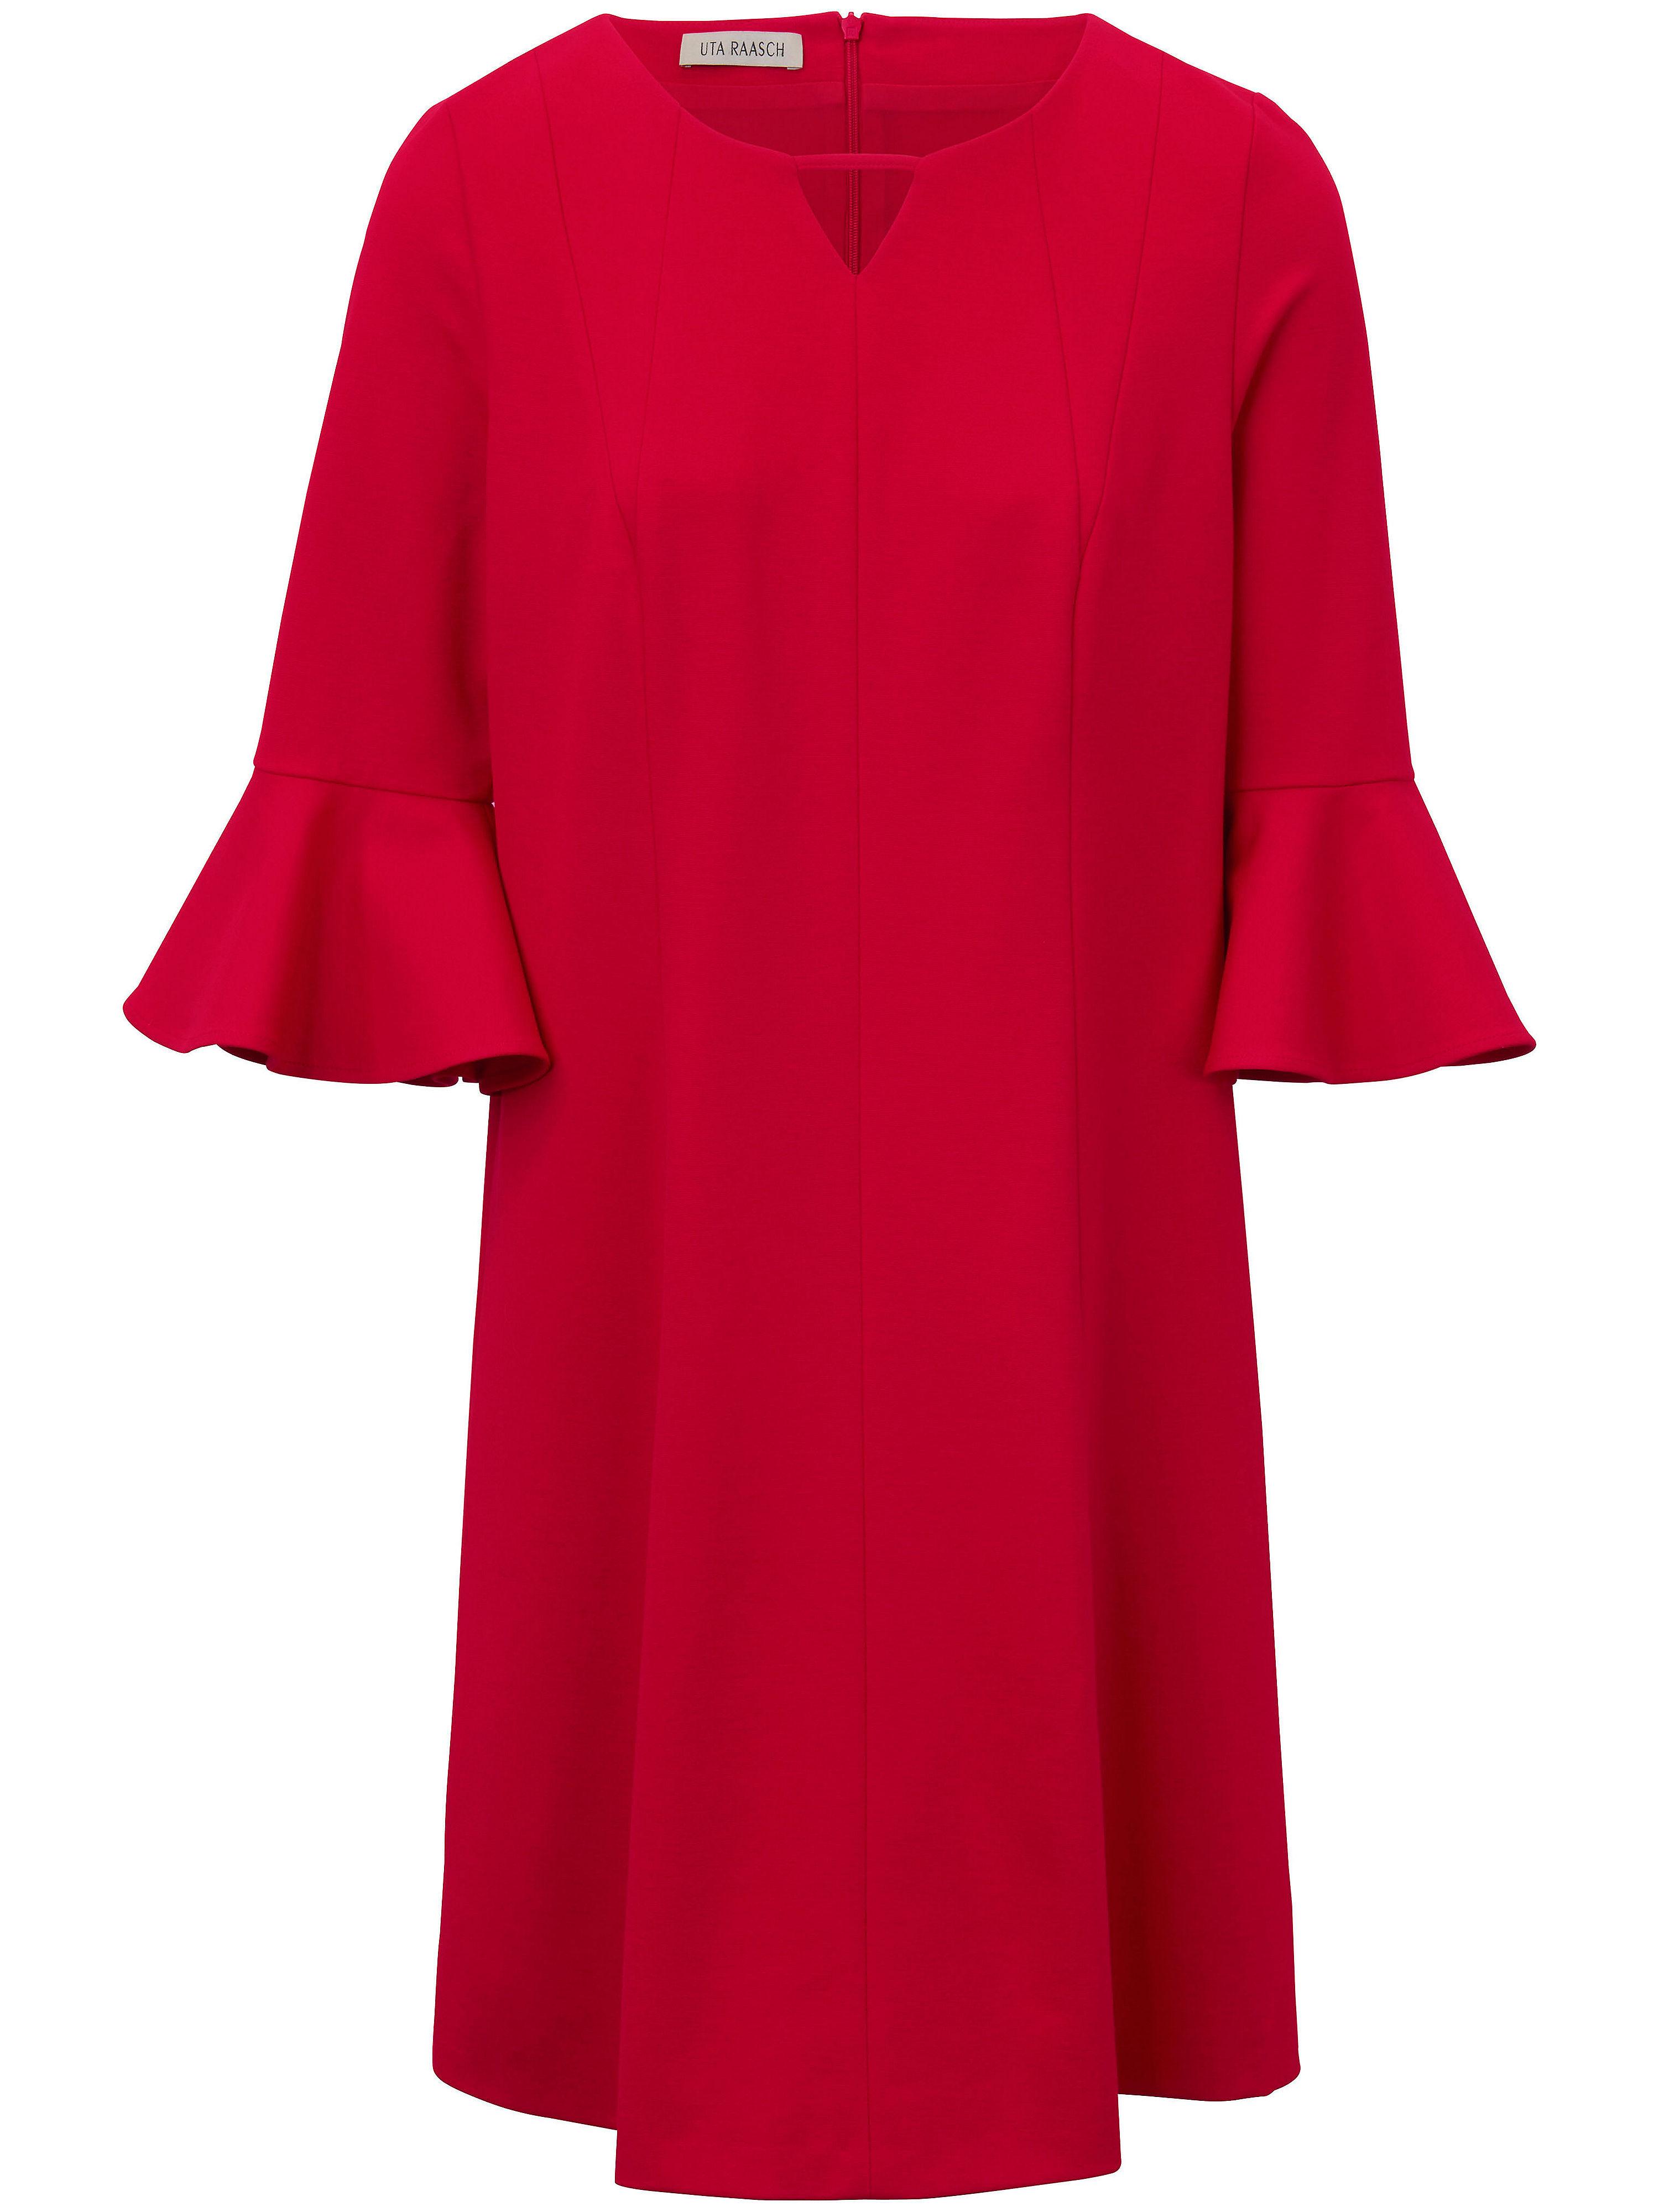 Uta Raasch jerseyjurk met 3/4-mouwen rood